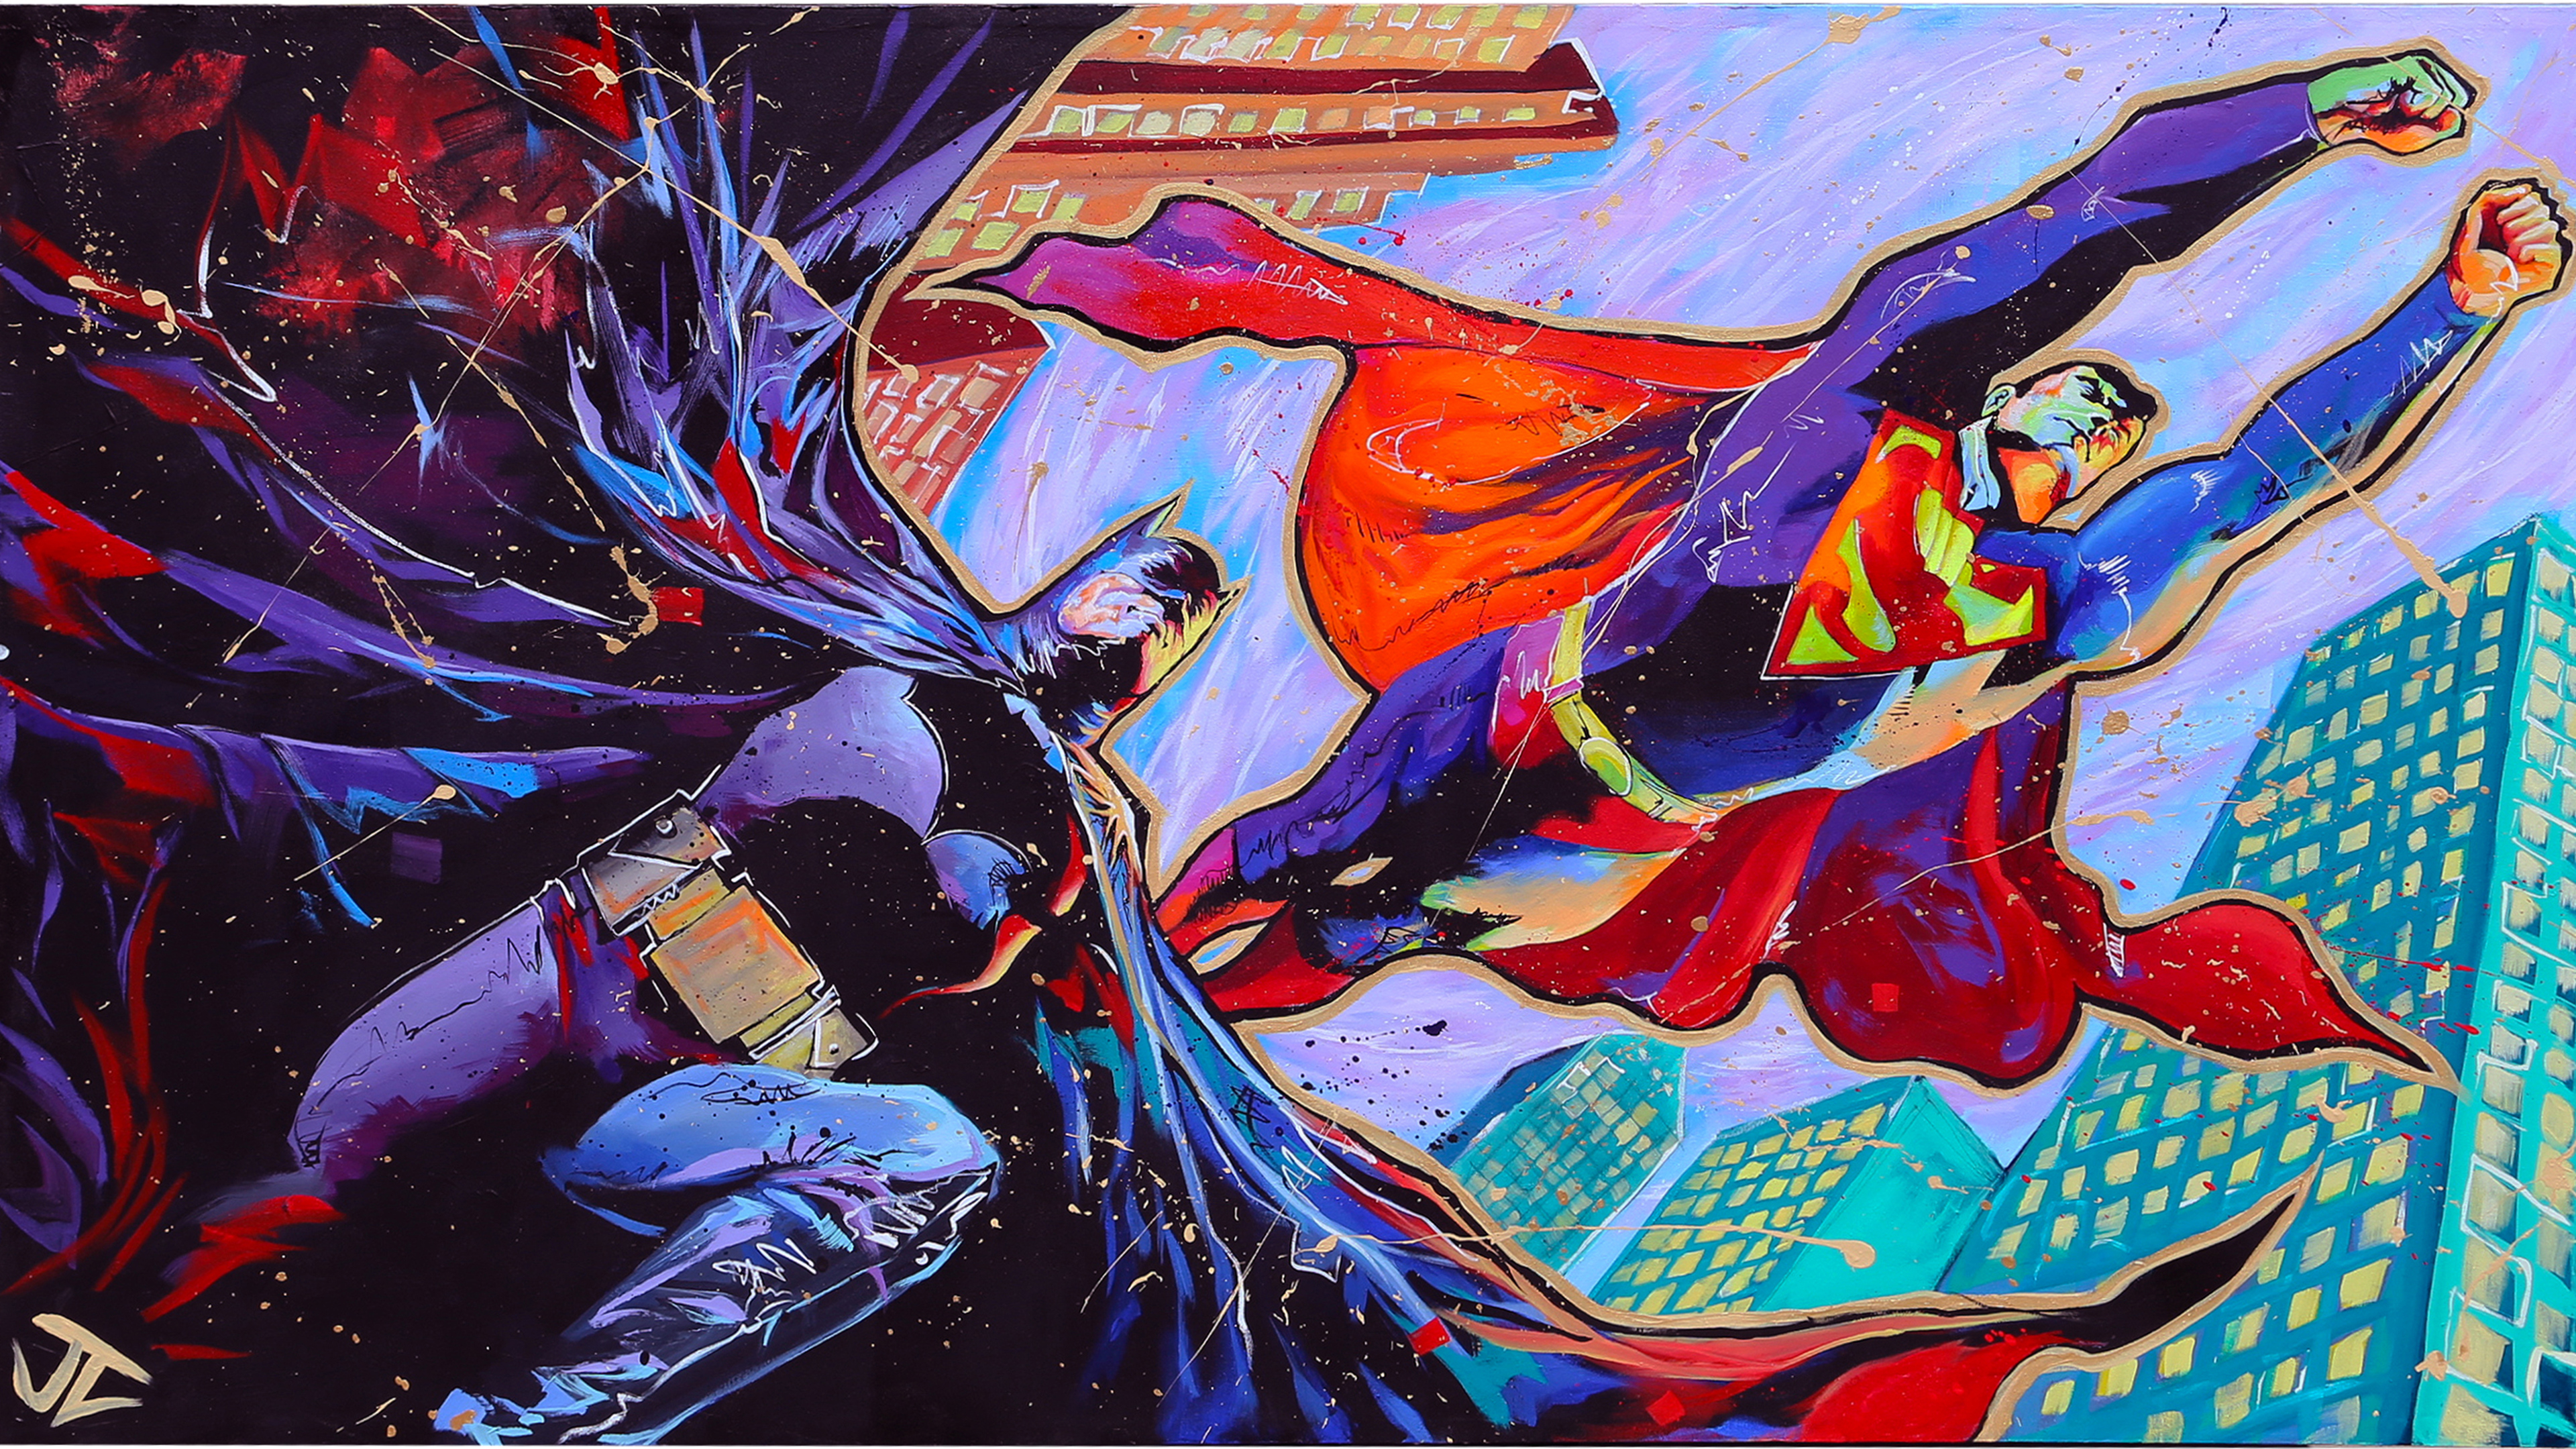 batman superman glitch art 4k 1544286754 - Batman Superman Glitch Art 4k - superman wallpapers, superheroes wallpapers, hd-wallpapers, digital art wallpapers, batman wallpapers, artwork wallpapers, artist wallpapers, 4k-wallpapers